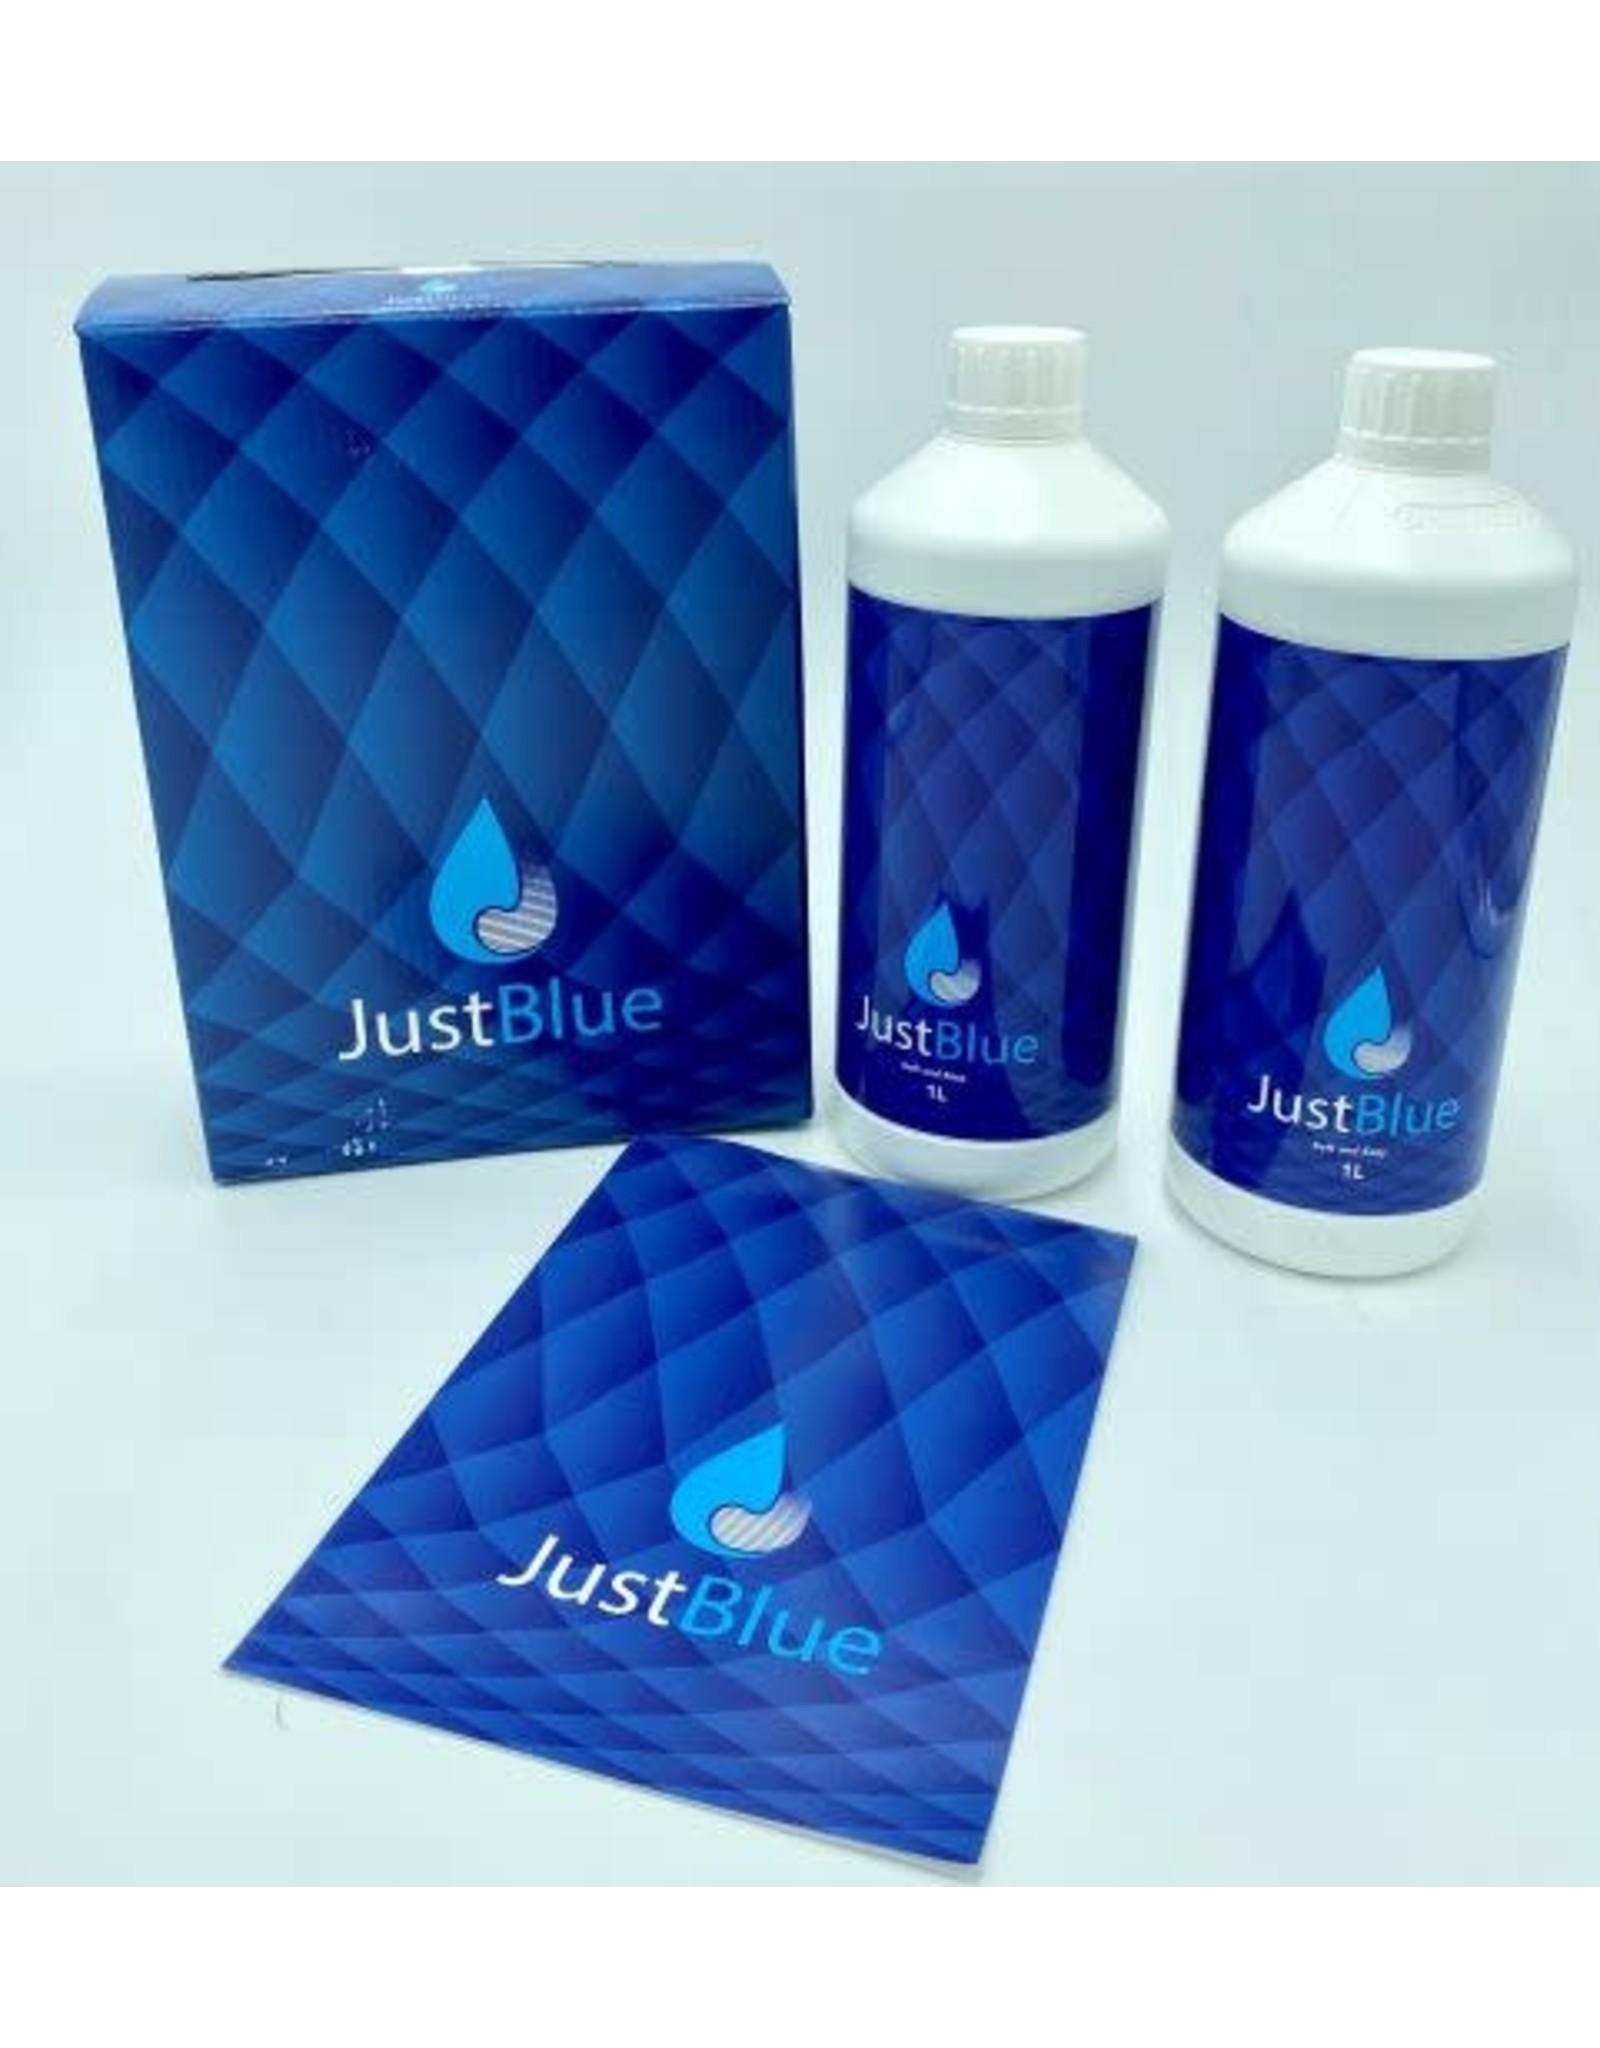 Just Blue JustBlue 2*1lt